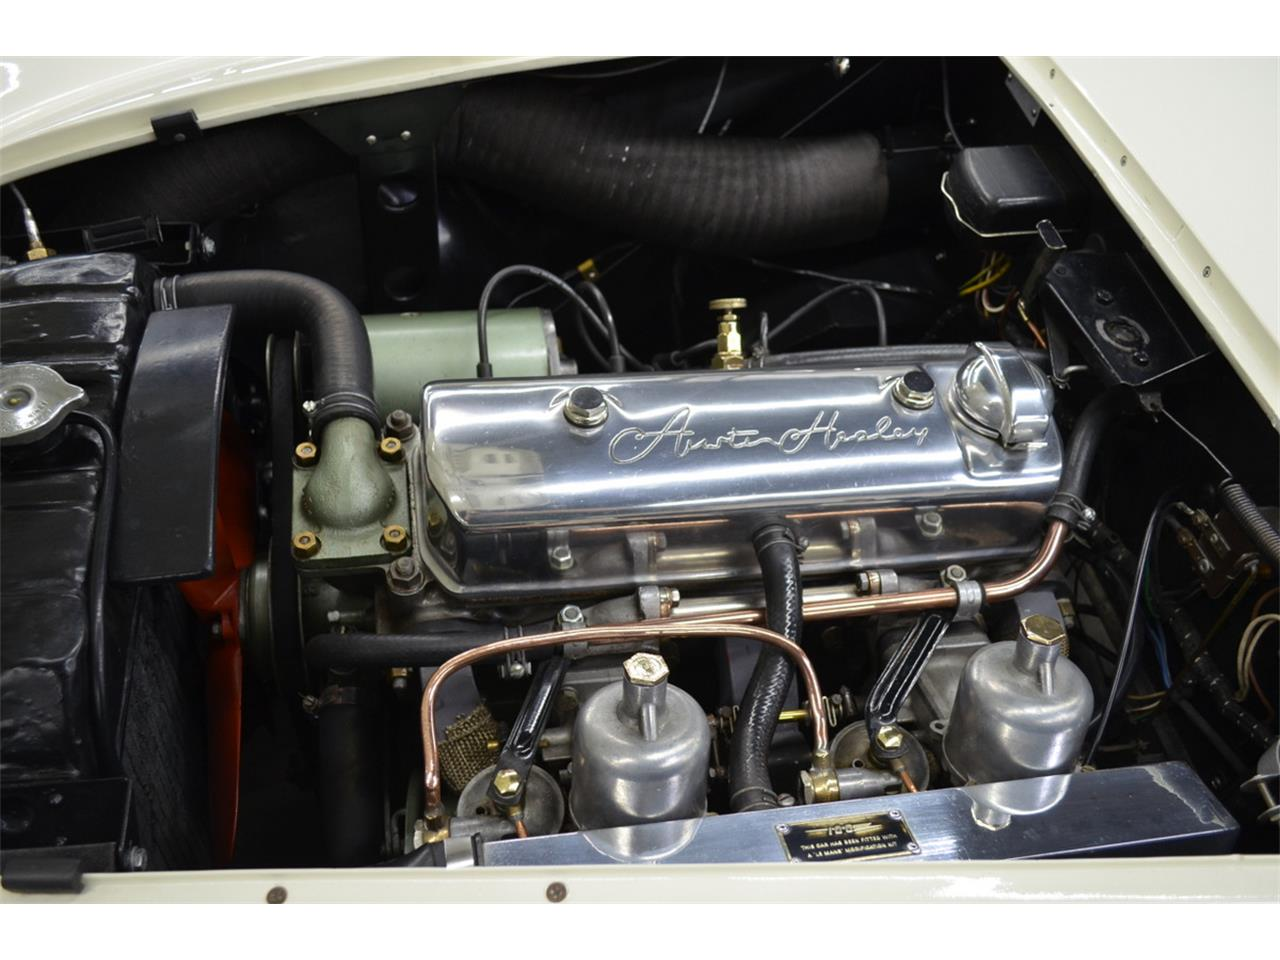 1954 Austin-Healey 100 (CC-1334325) for sale in Huntington Station, New York